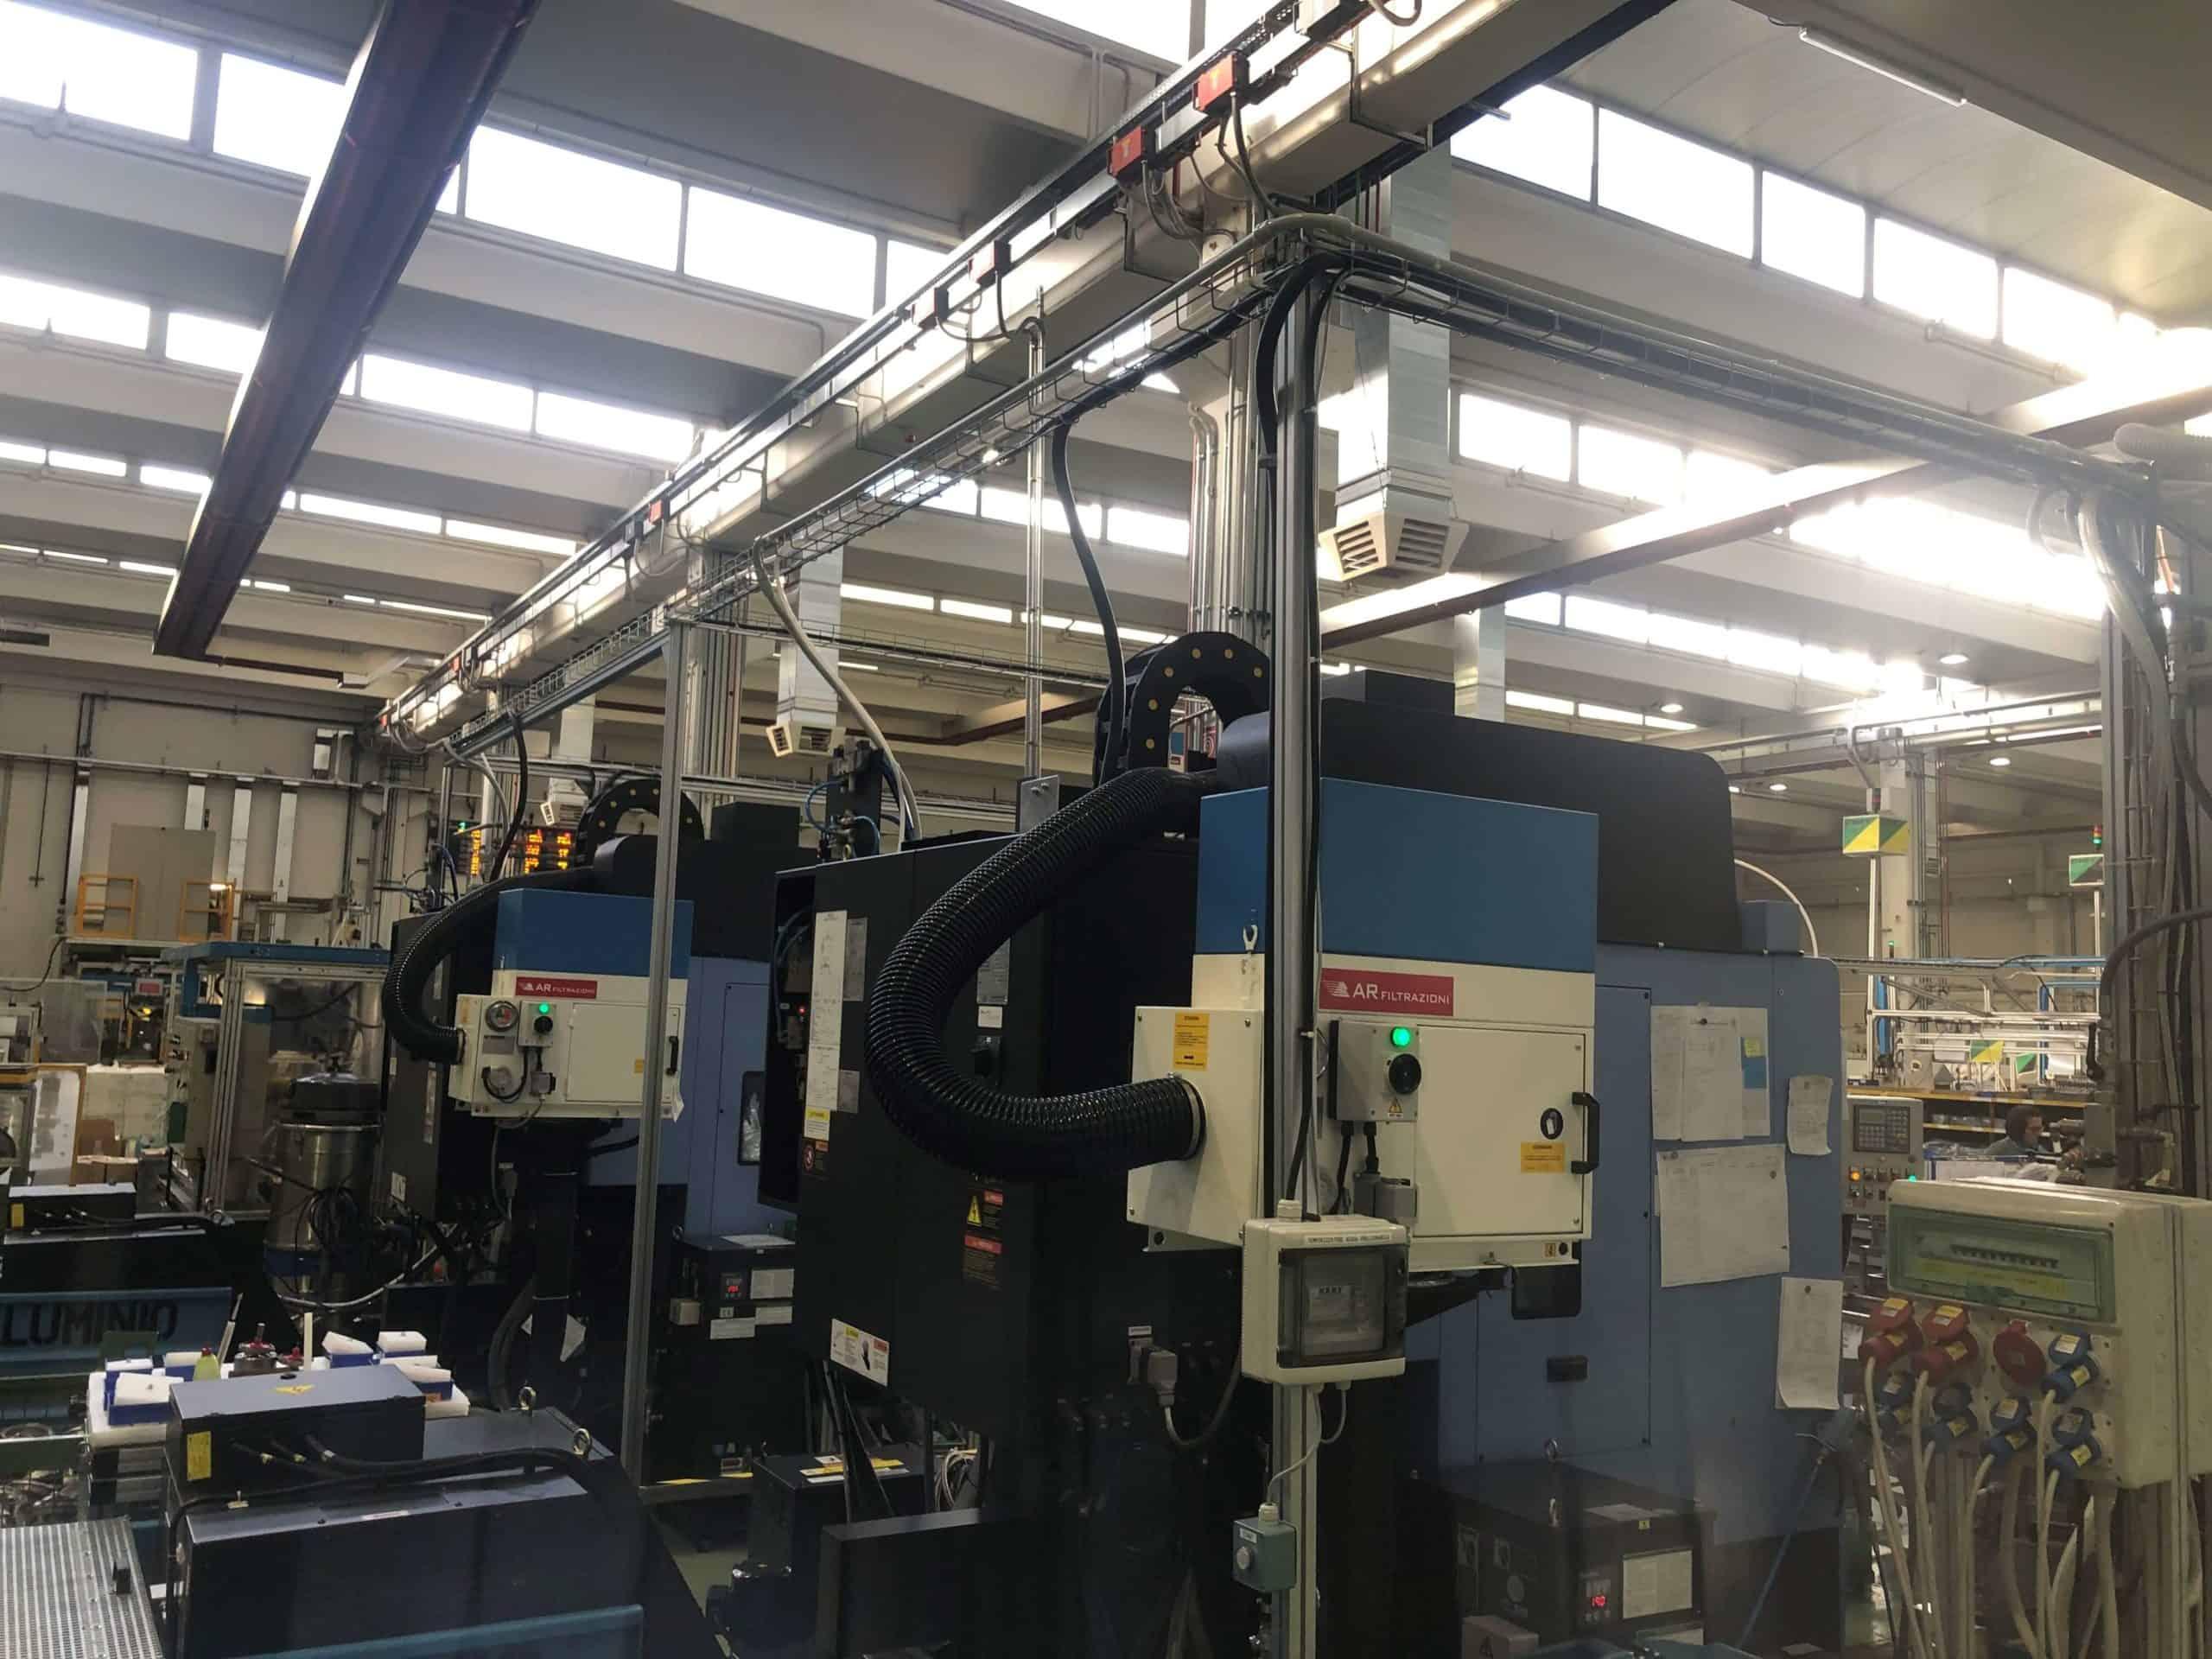 AR Filtrazioni | Doosan Daewoo depuratori aria centro di lavoro Doosan Daewoo